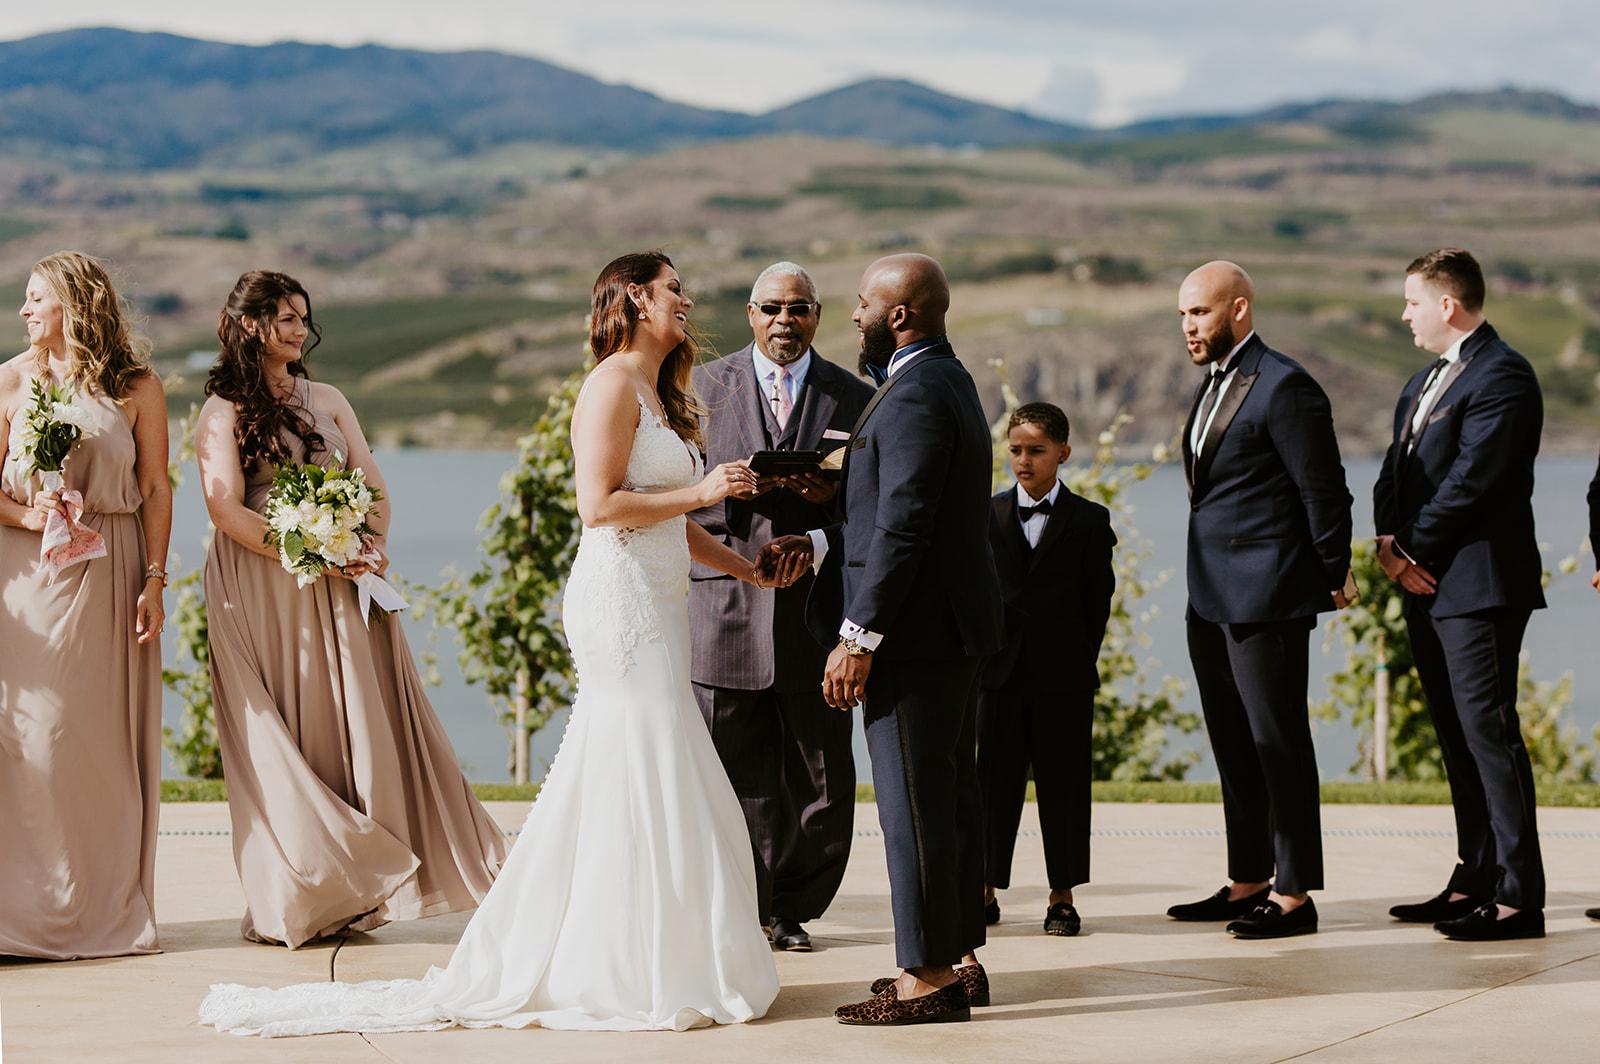 Danielle + Shey- Wedding Photos - Karma Vineyards - Sneak Peeks! - Meme Urbane Photography-15_websize.jpg